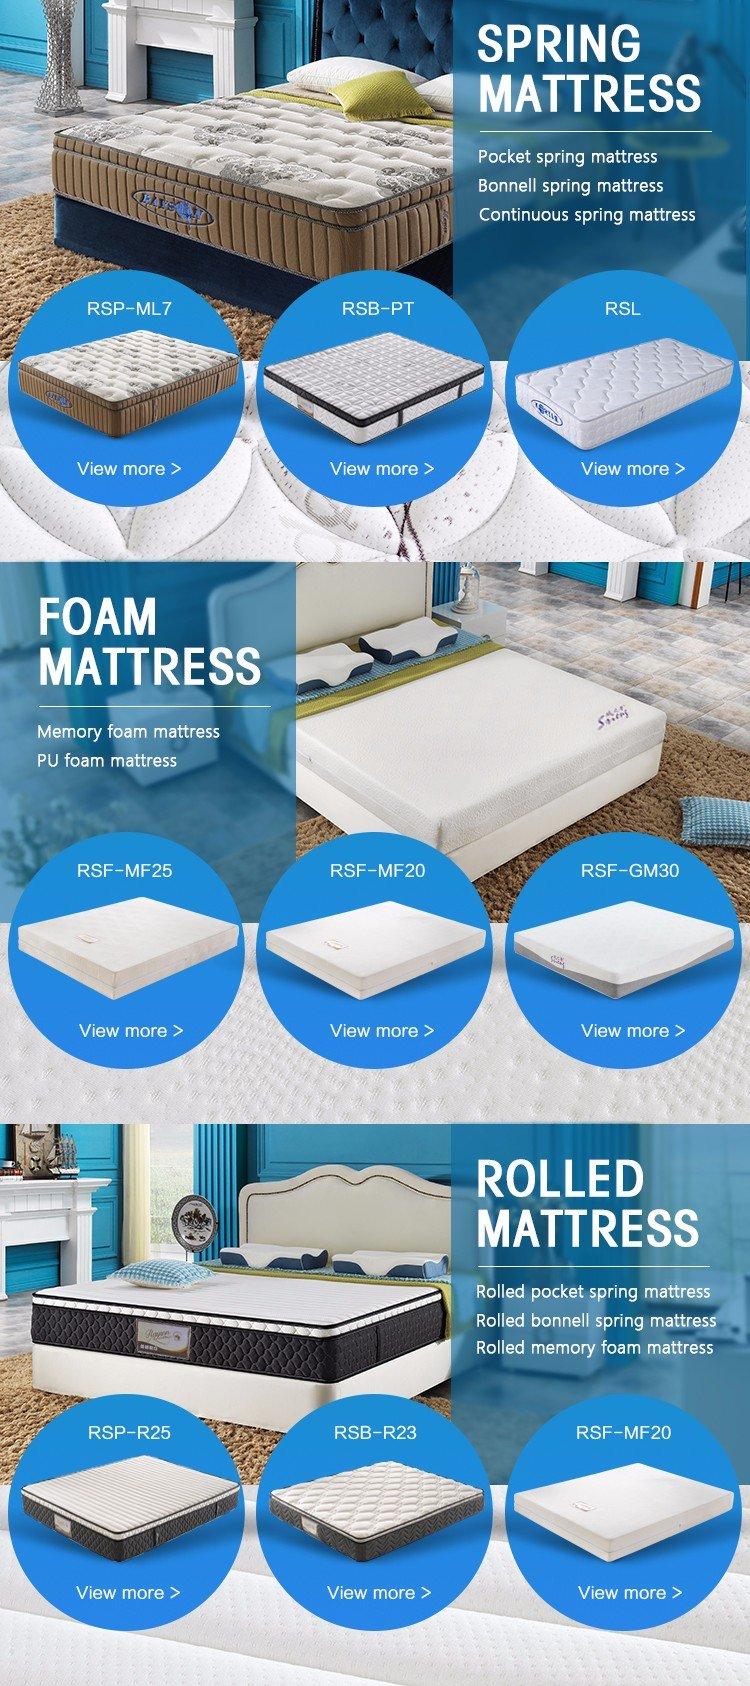 Rayson Mattress Latest Rolled bonnell spring mattress Suppliers-10